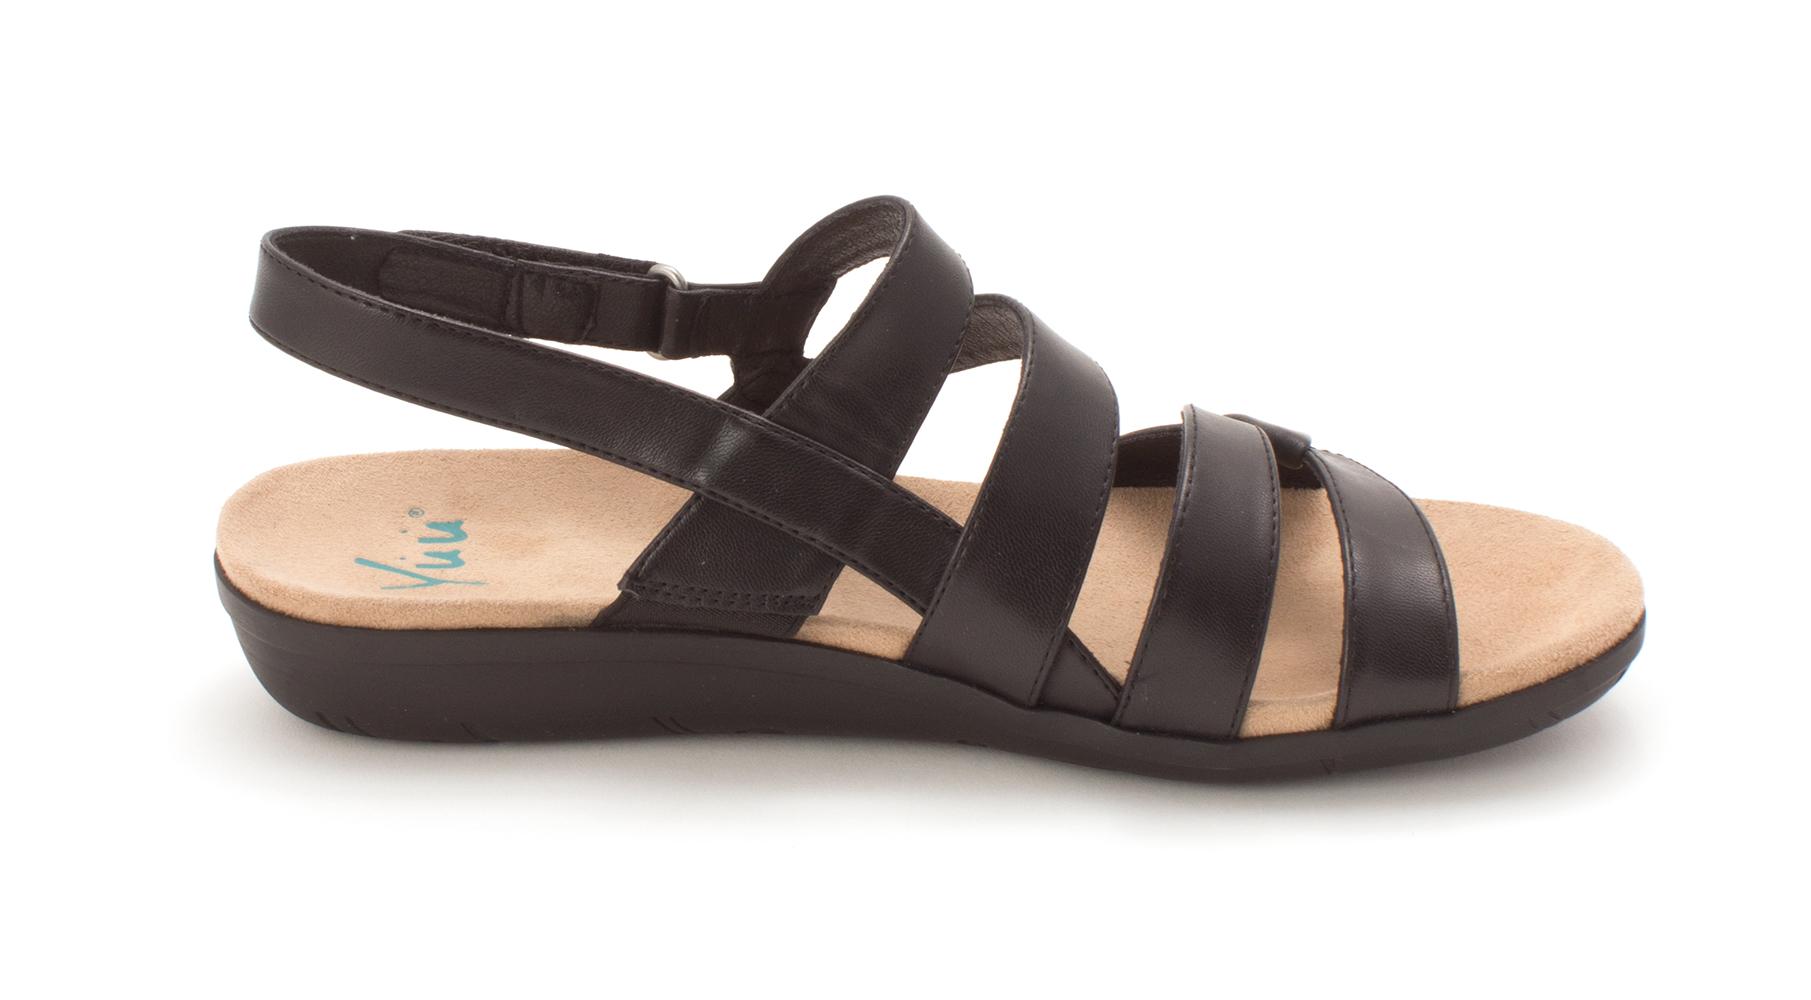 0fa2d9a7bd12 Yuu Womens Janne Open Toe Casual Strappy Sandals